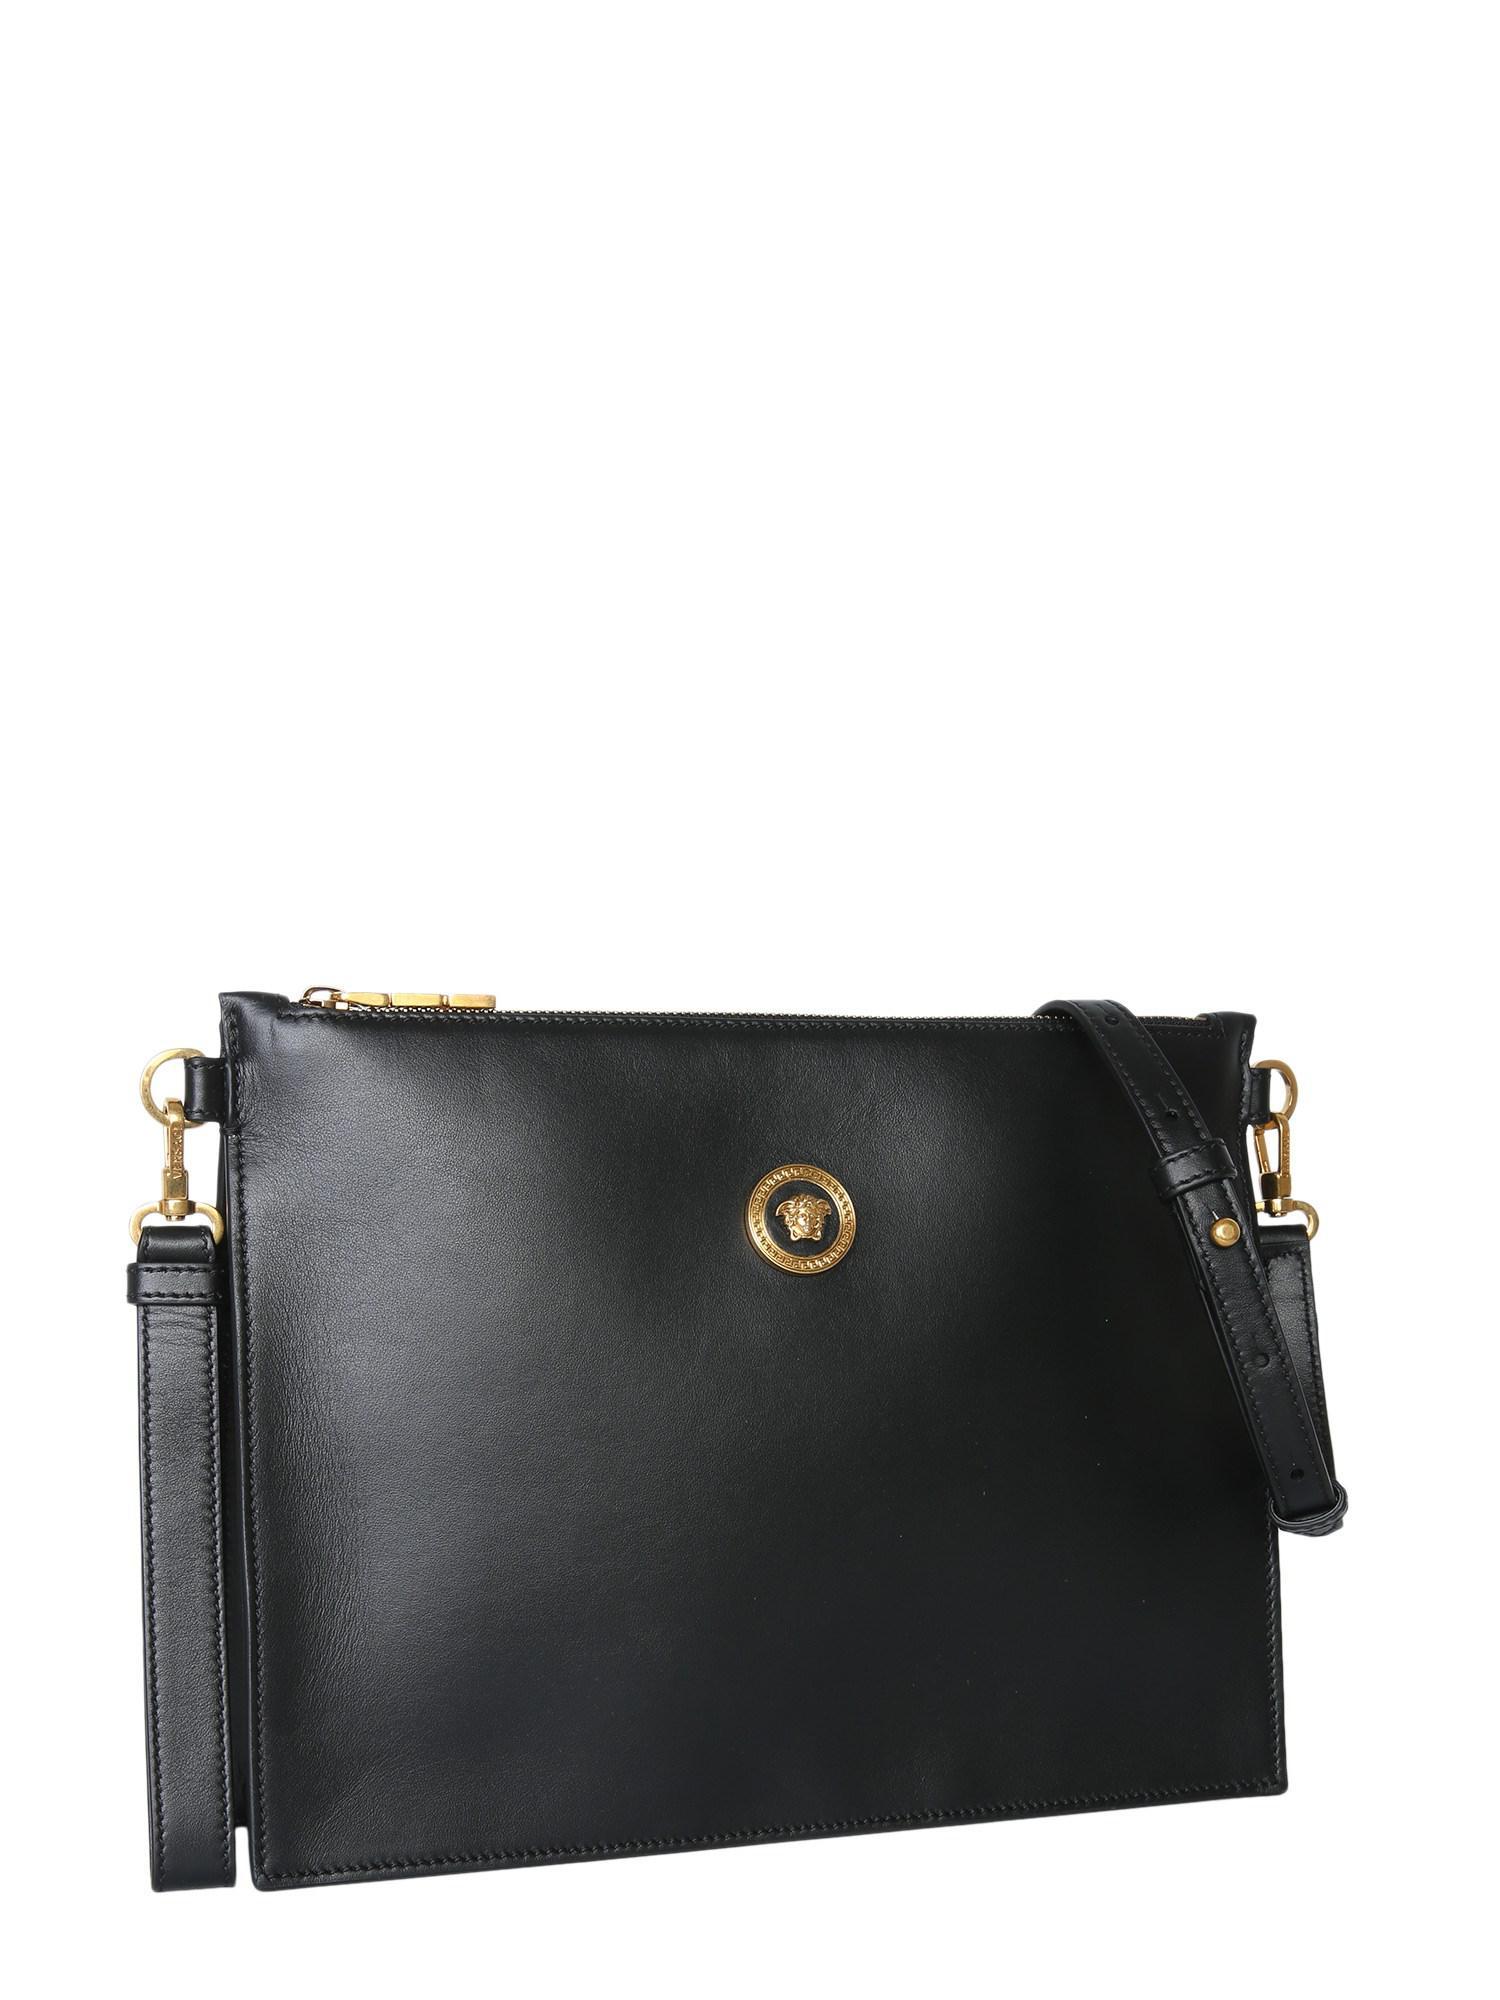 b3f4b1bd90 Versace - Black Large Medusa Leather Clutch - Lyst. View fullscreen